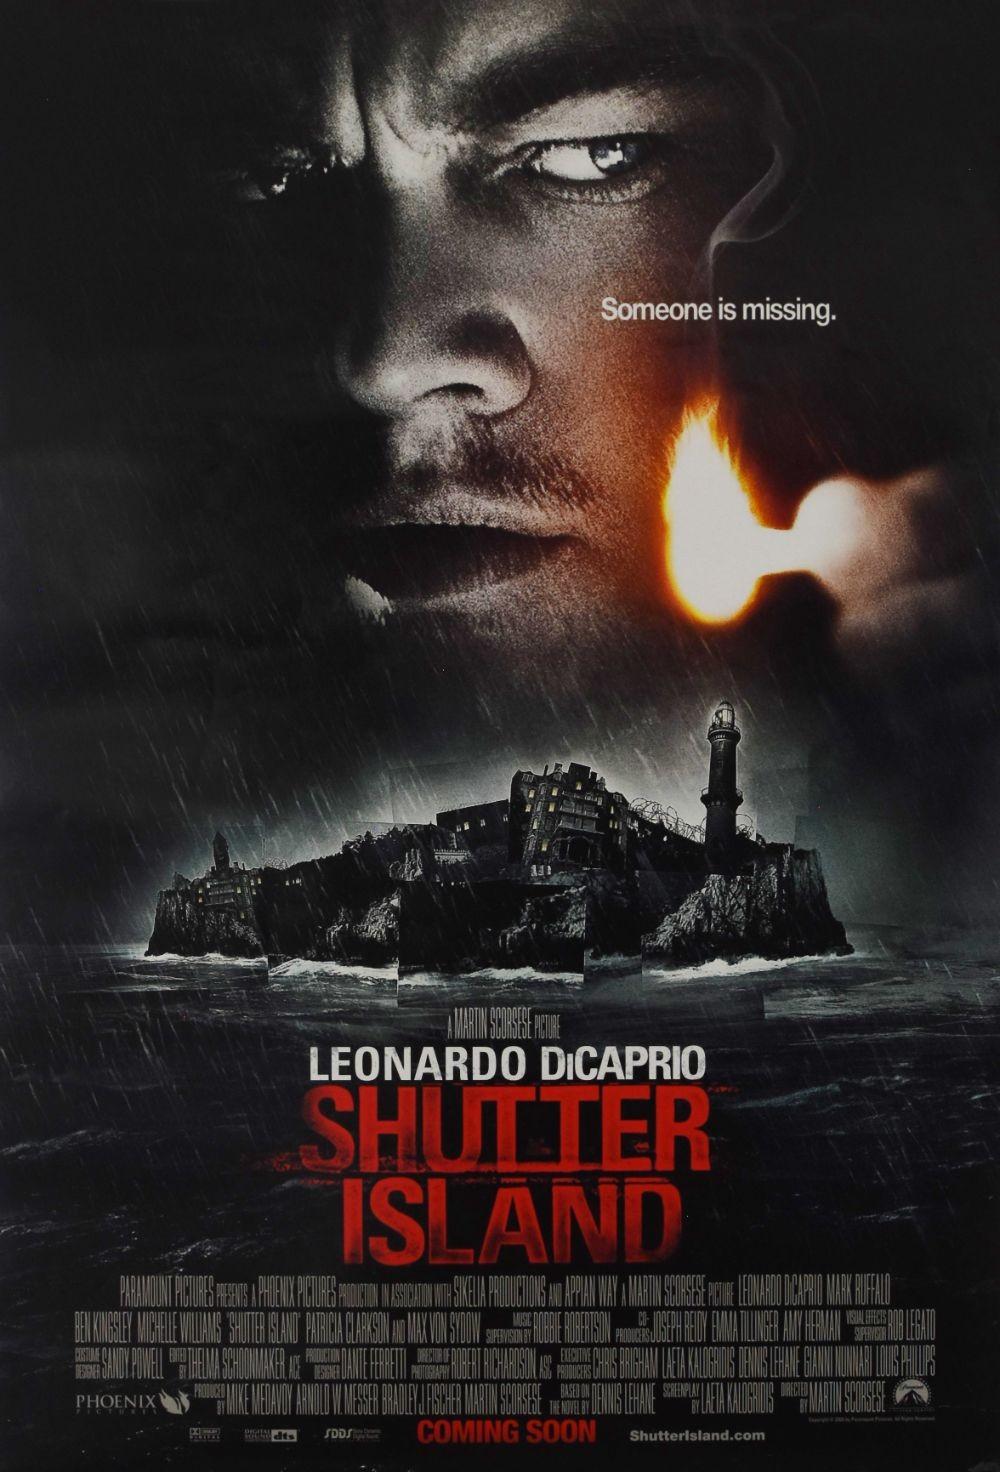 Shutter Island original movie poster